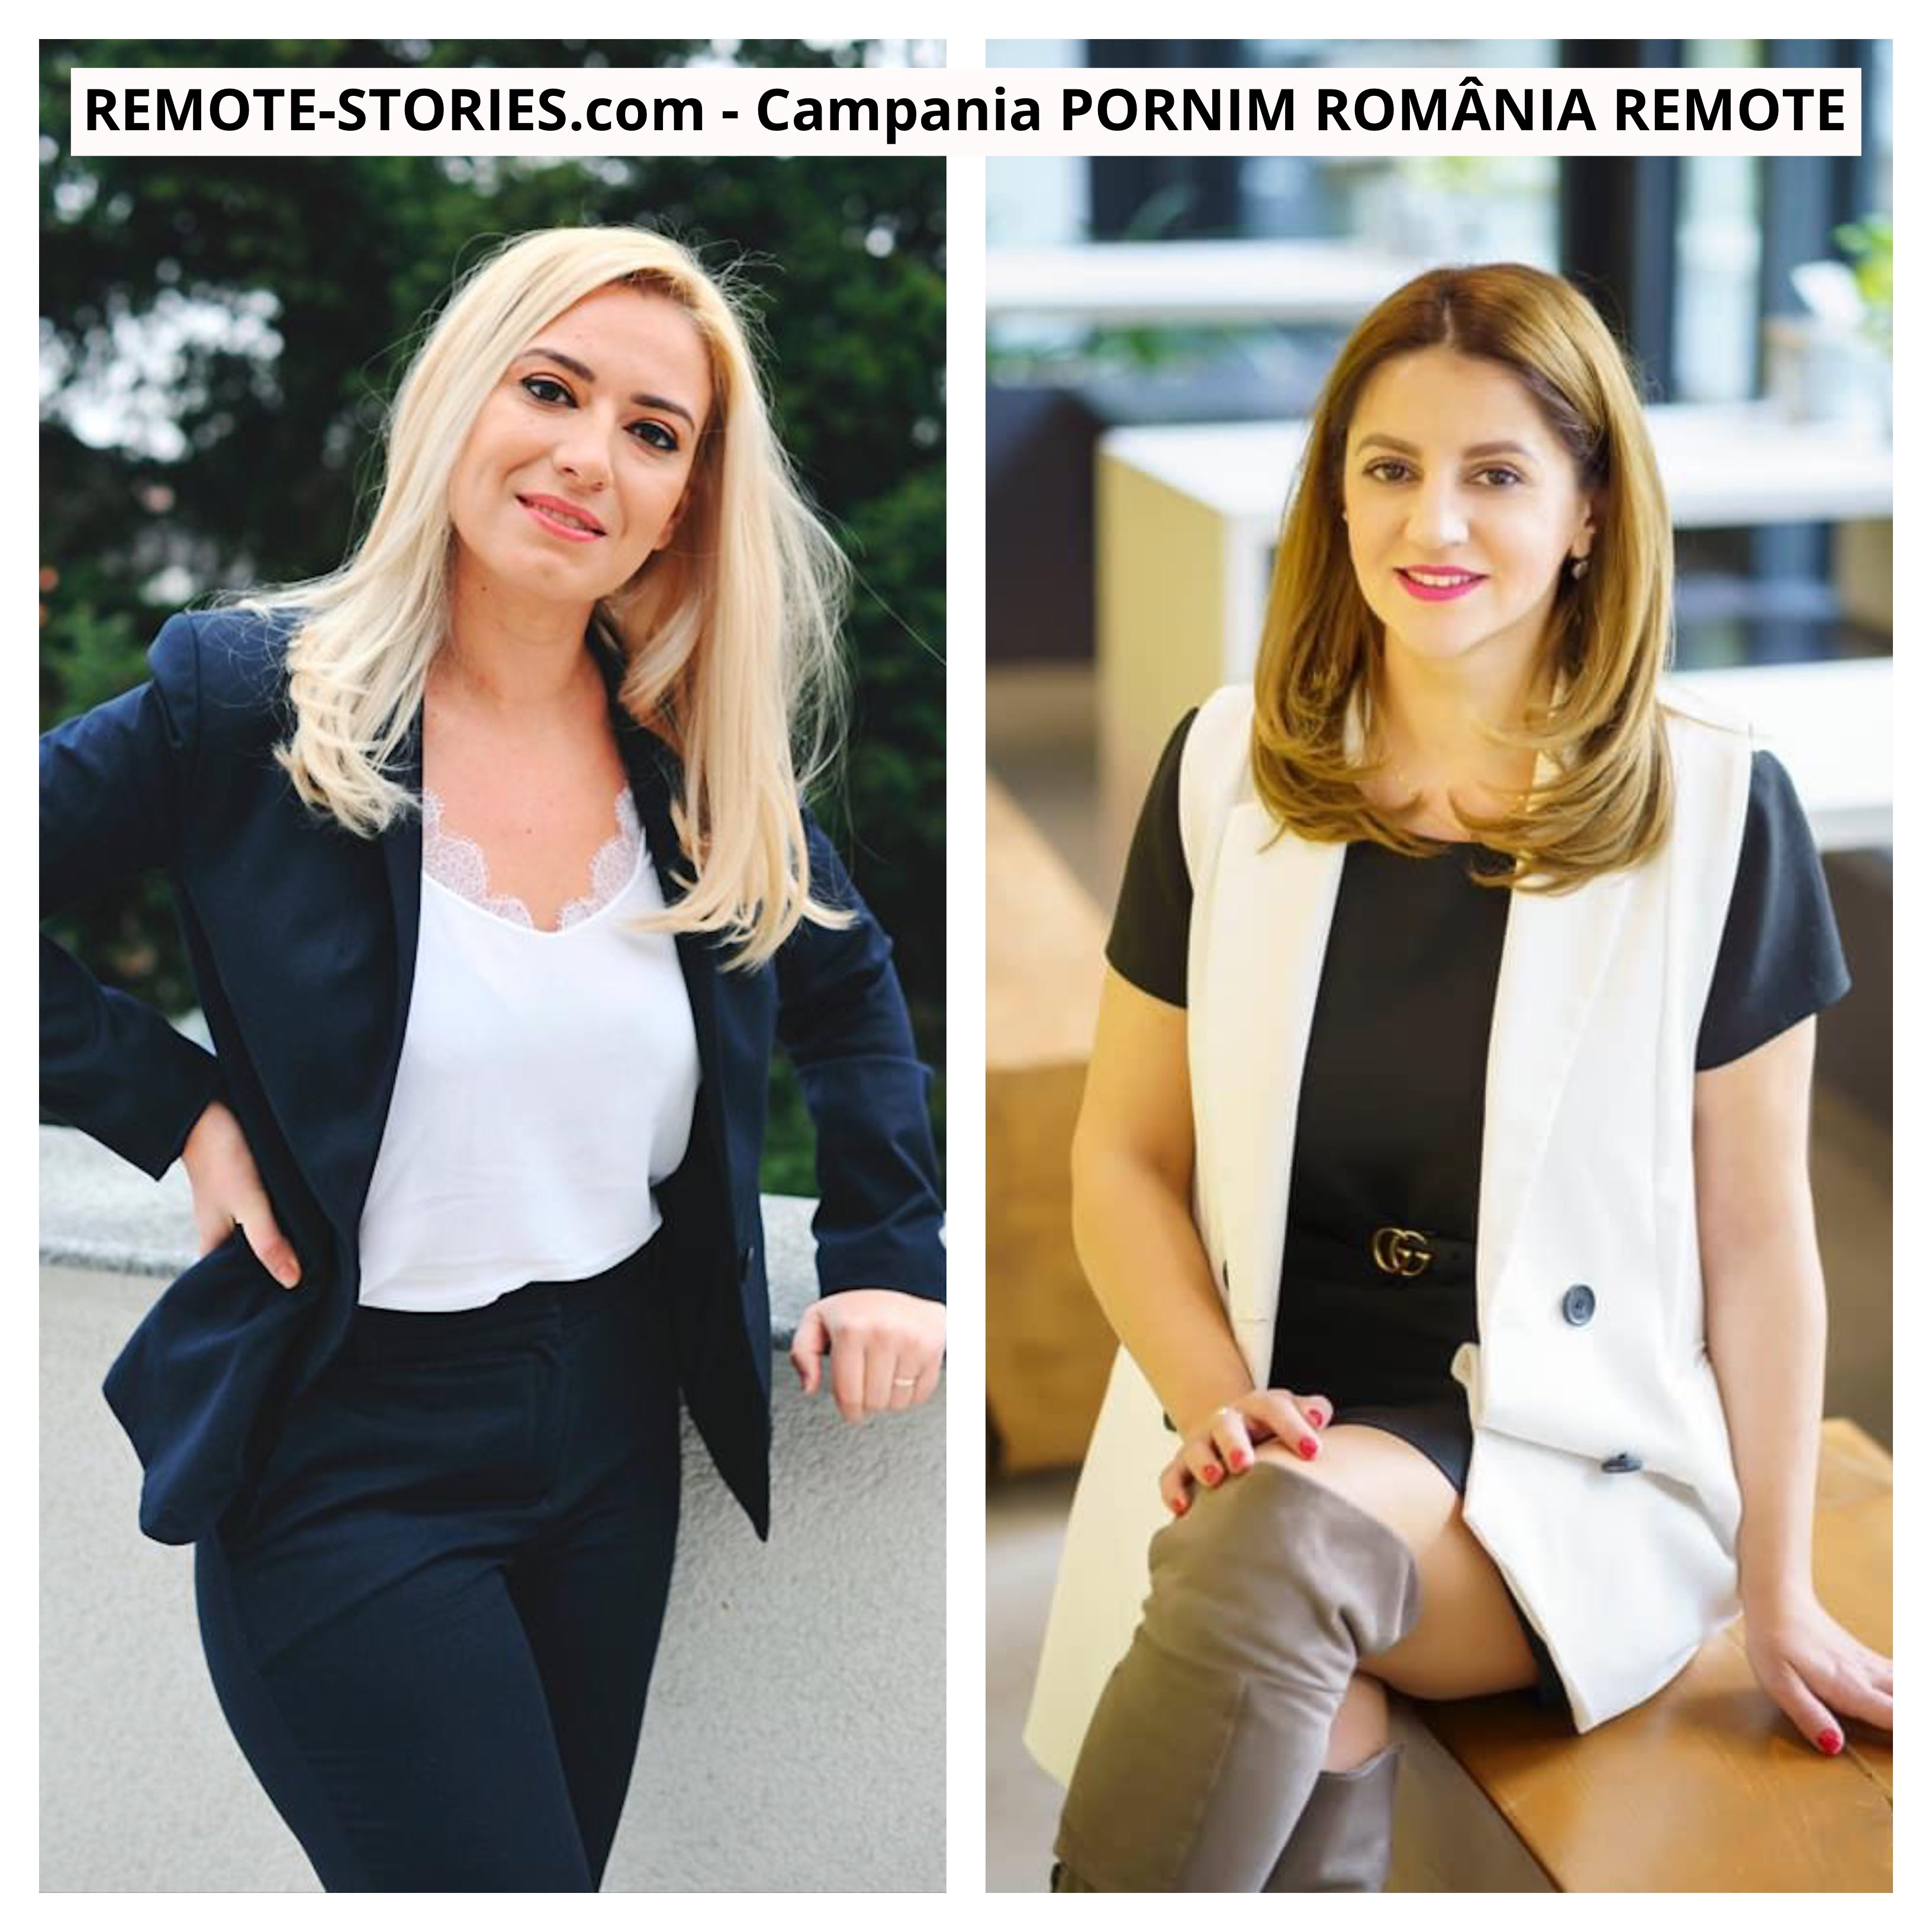 Remote Stories Pornim România Remote